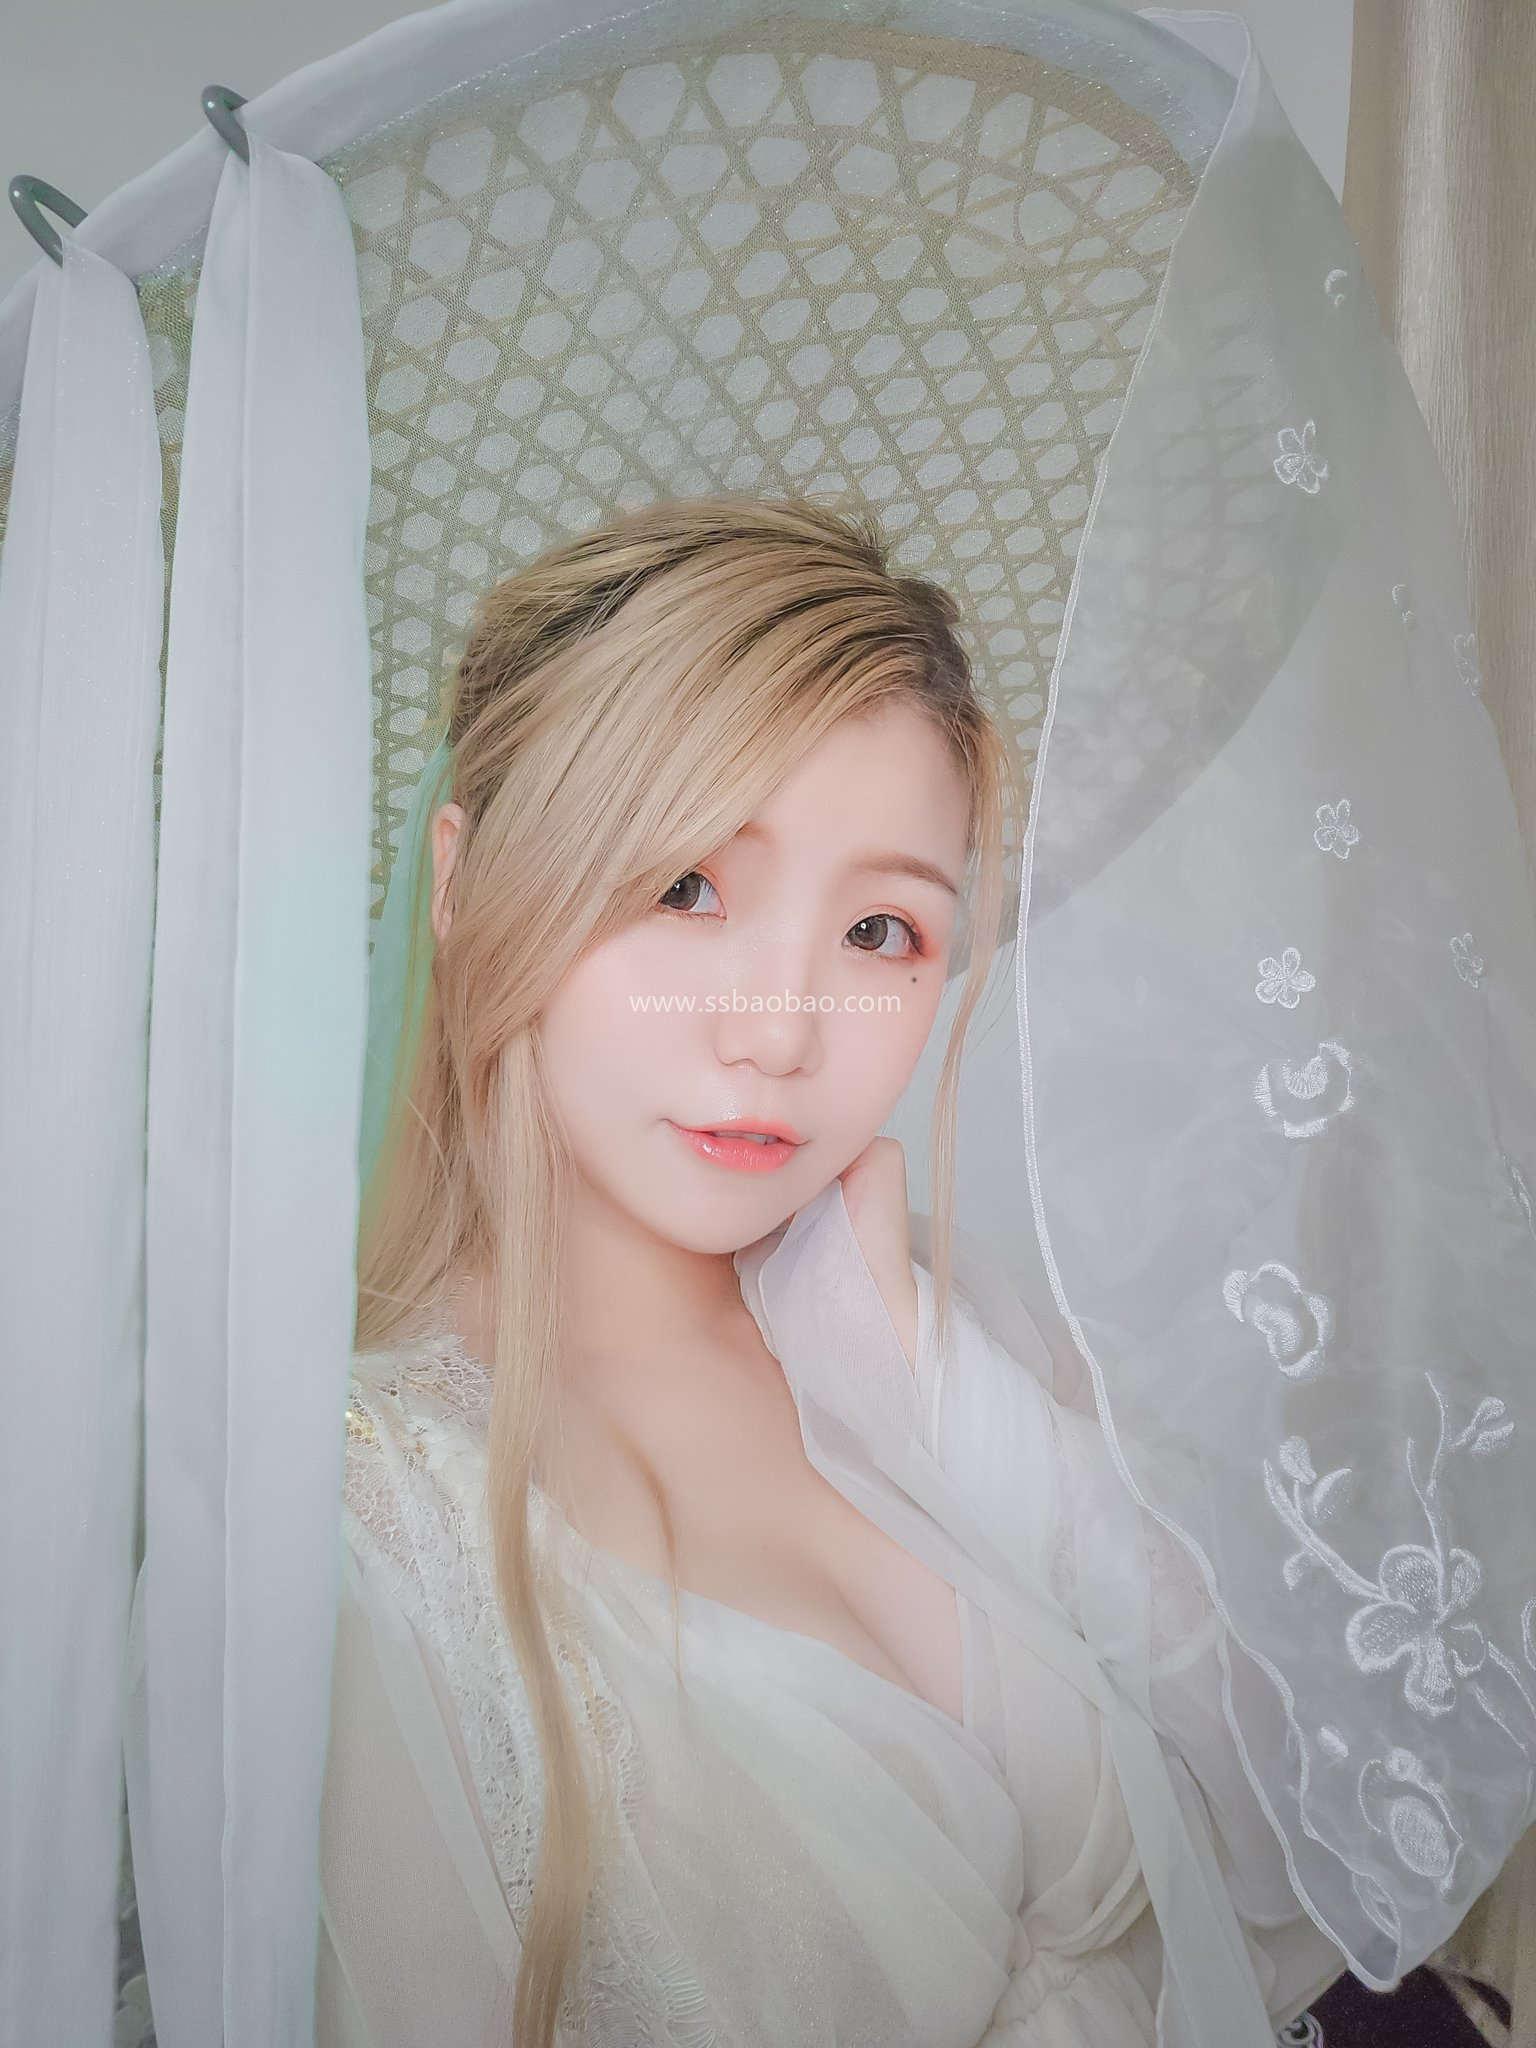 Yoko宅夏 - 自拍[10P]05